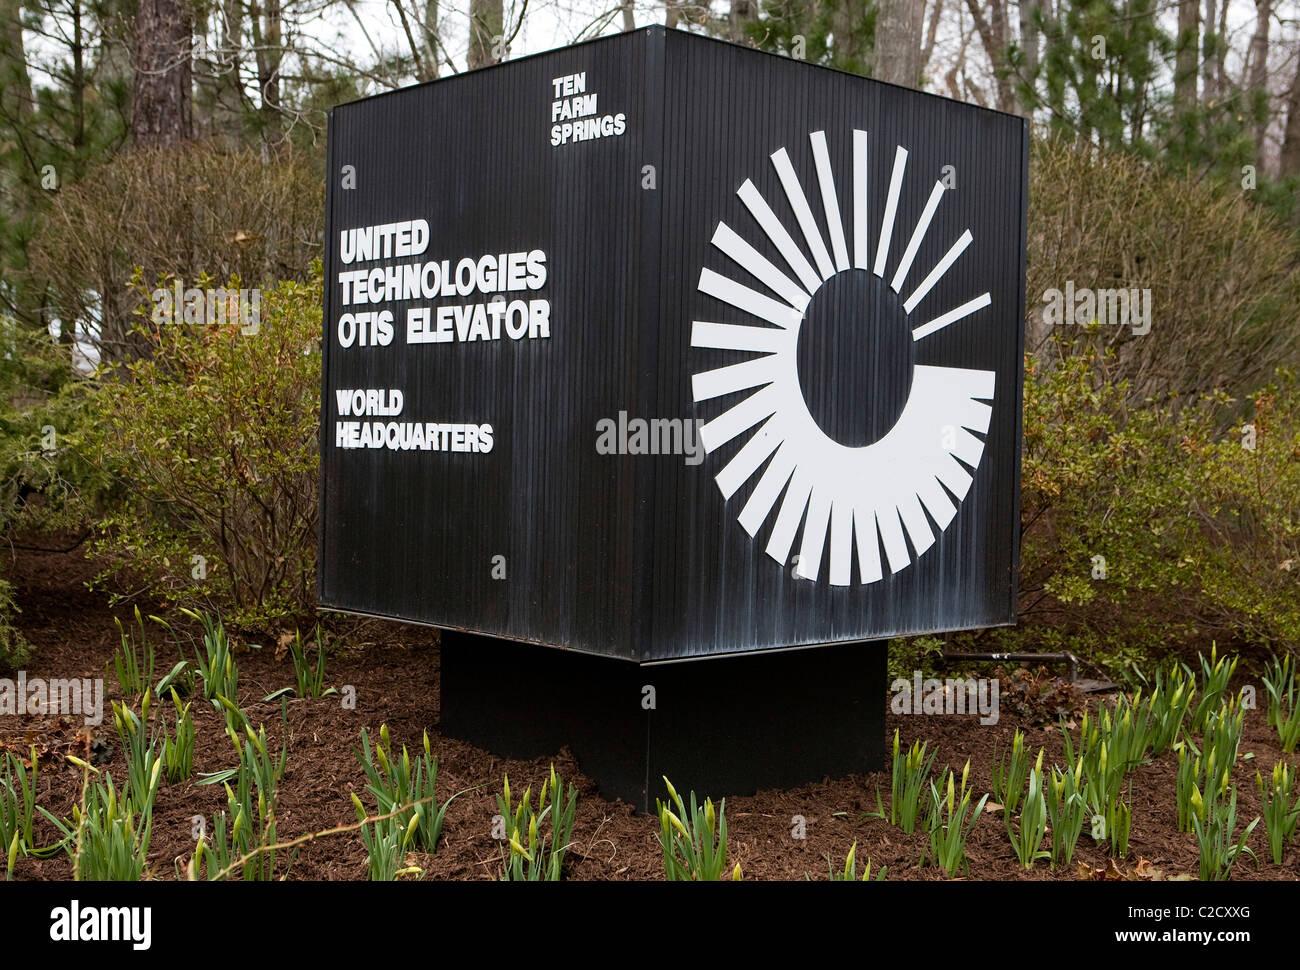 Le siège mondial de l'Otis Elevator. Photo Stock